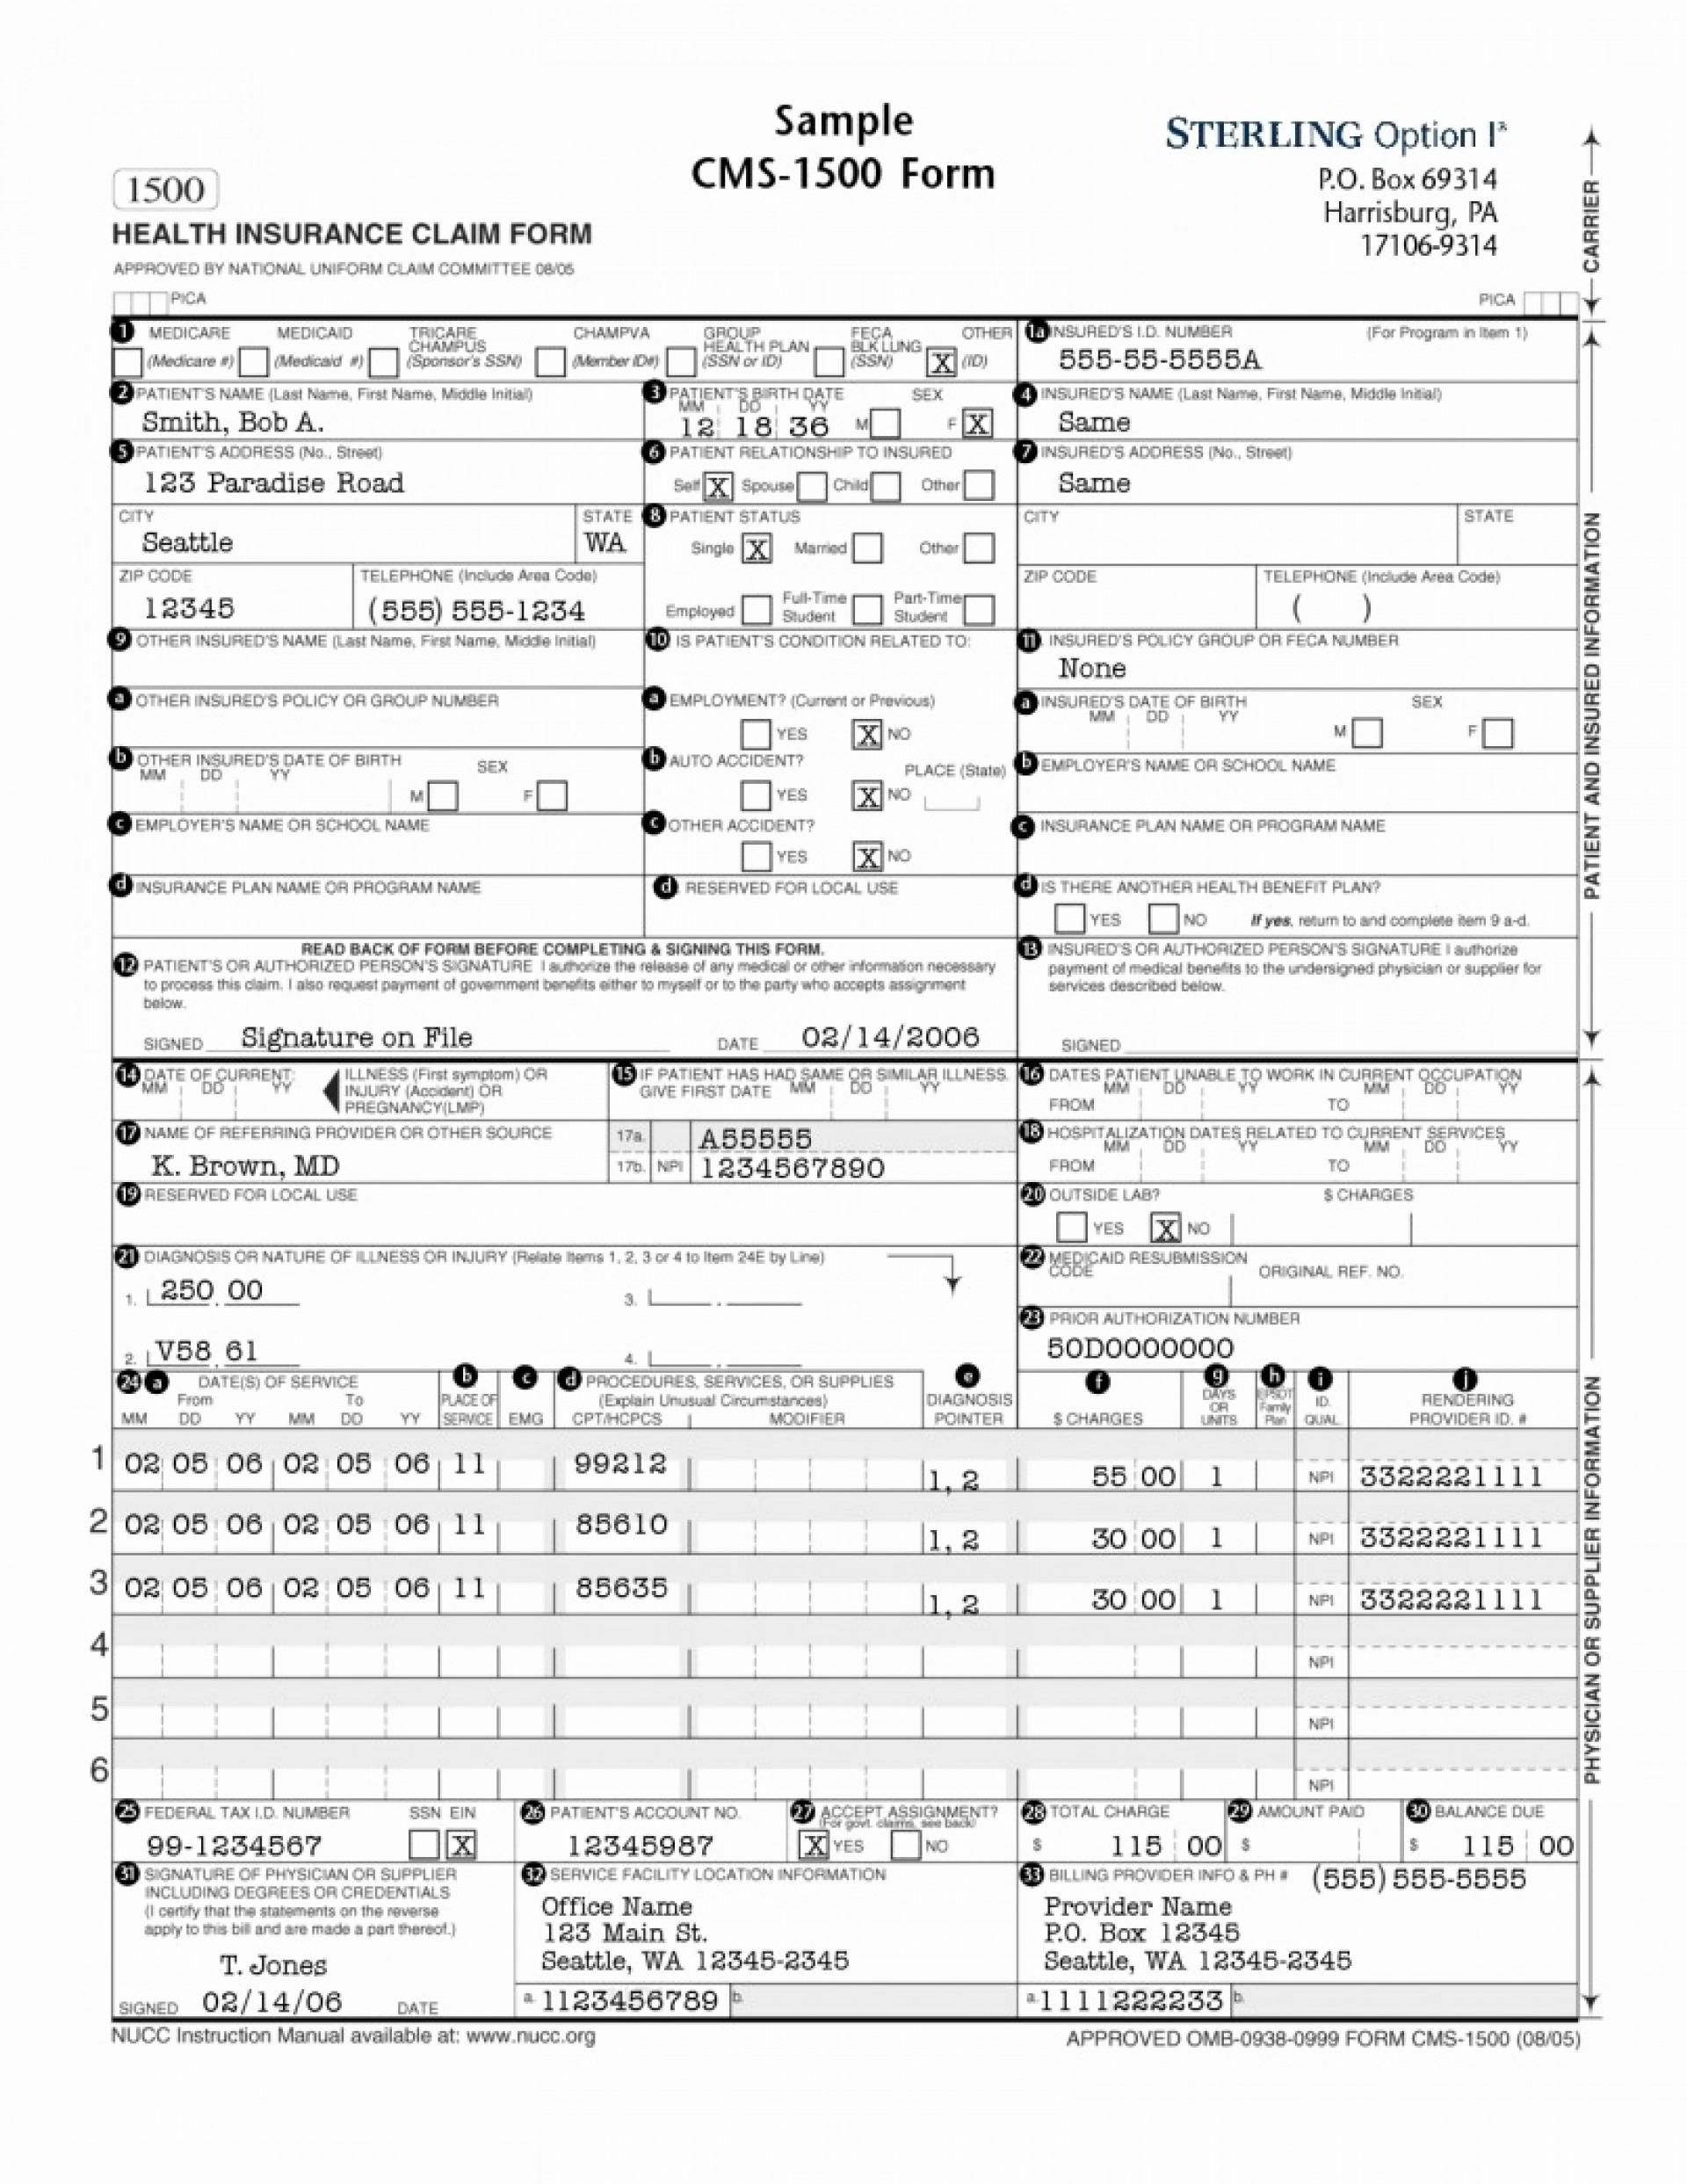 Cms 1500 Billing Form Instructions